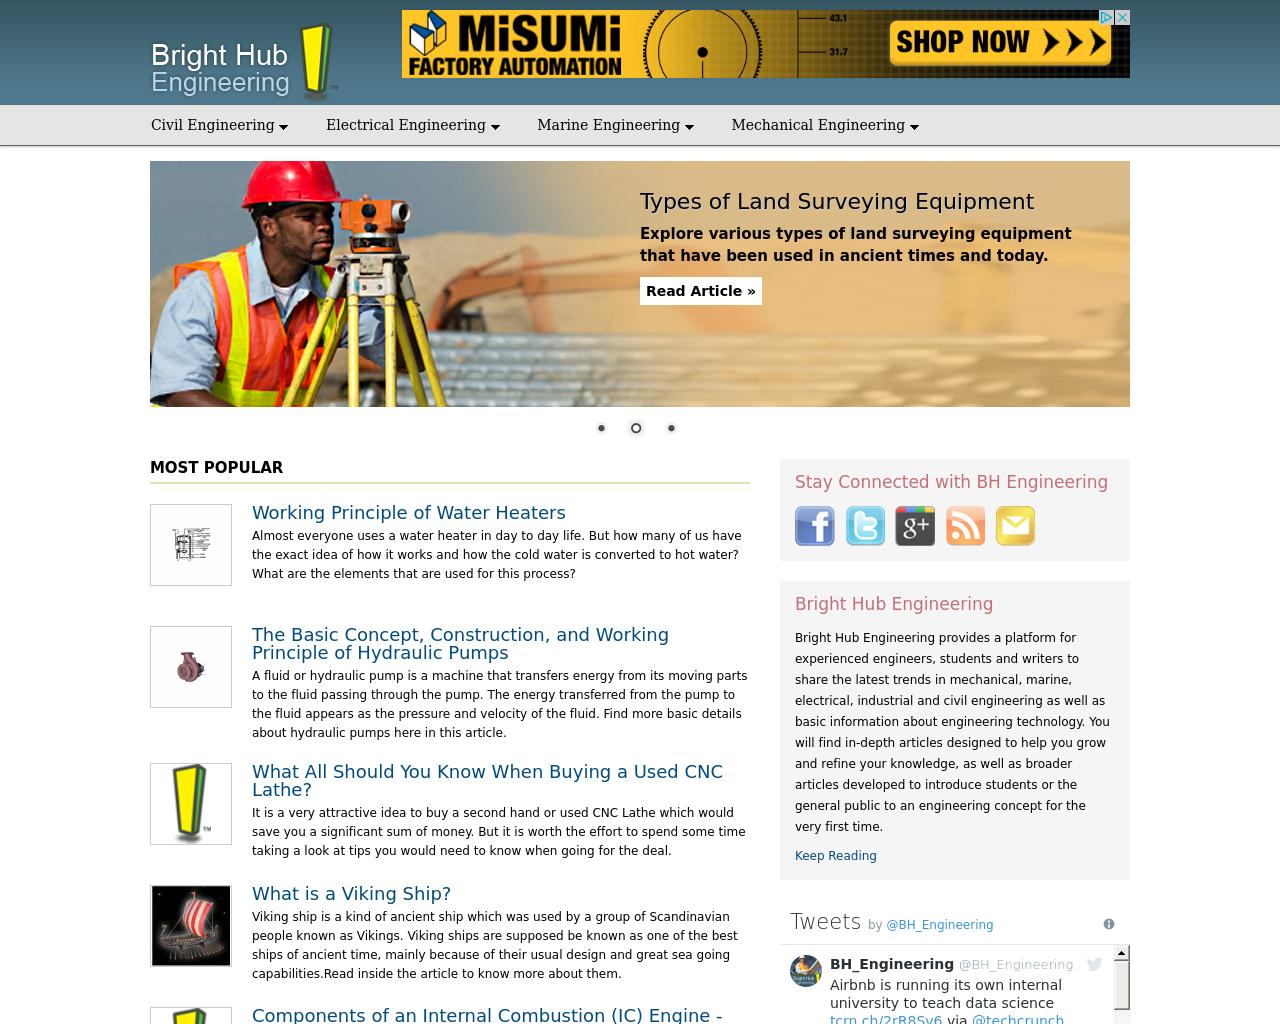 Bright-Hub-Engineering-Advertising-Reviews-Pricing